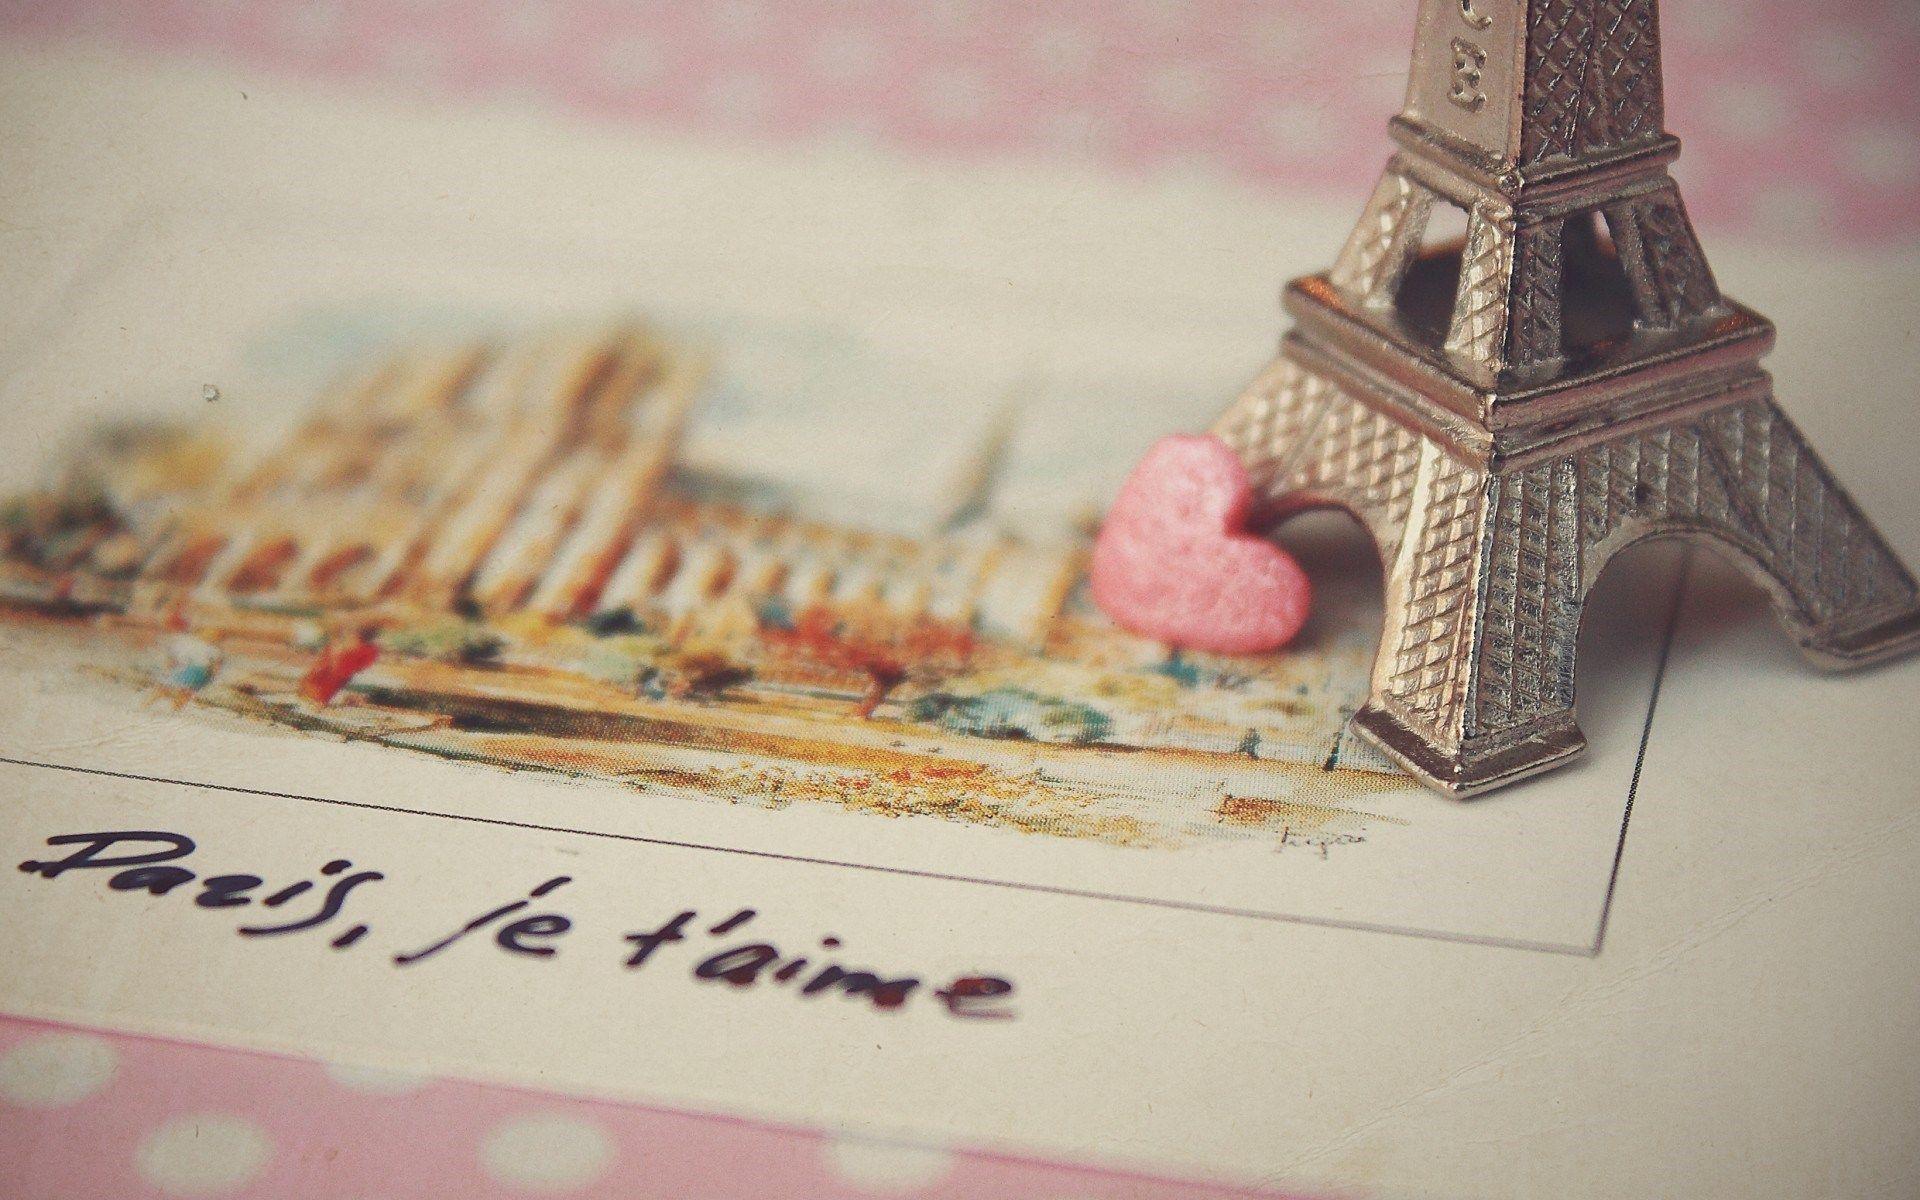 Wallpaper Love Paris Hd : 3687-love-in-paris.jpg 1,920x1,200 pixels Love,love Pinterest Paris